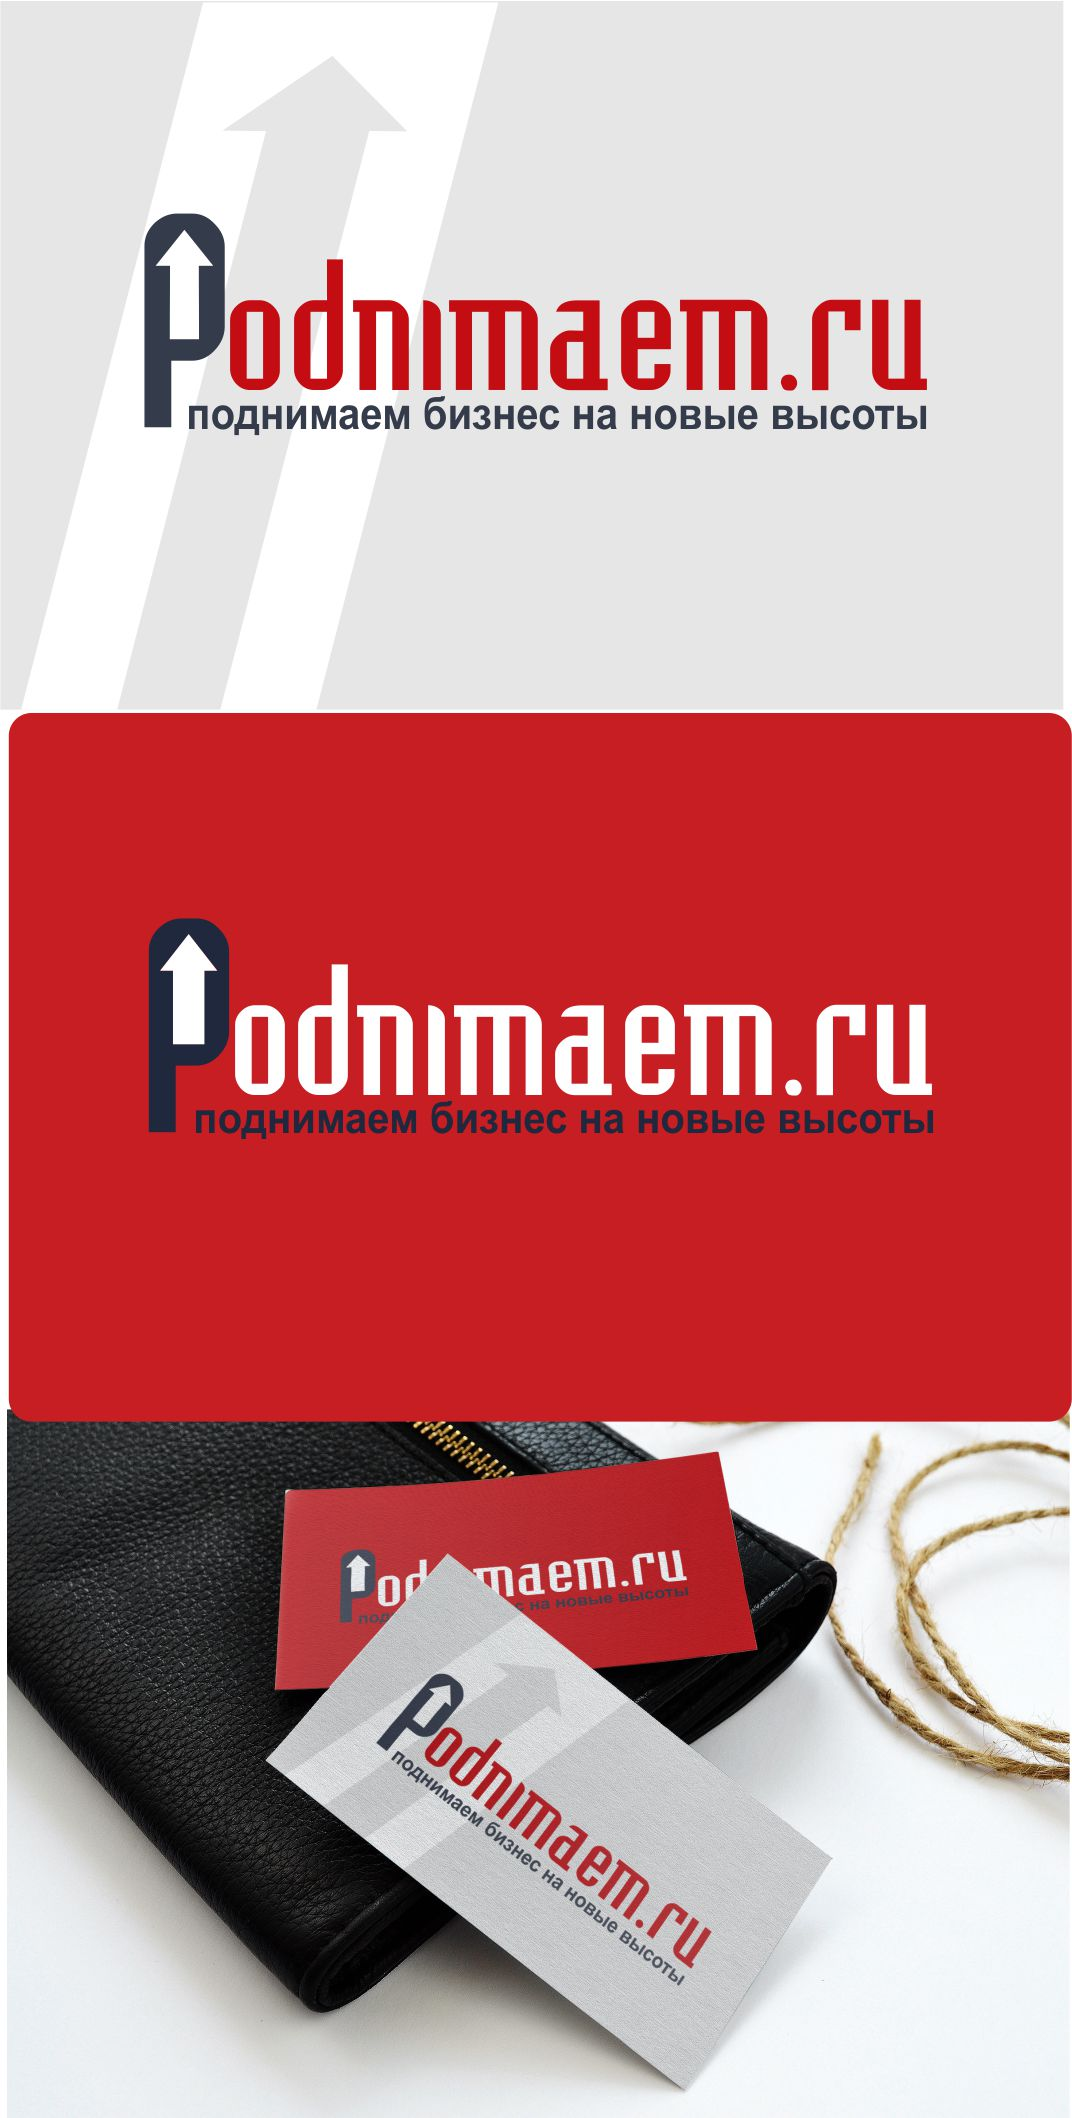 Разработать логотип + визитку + логотип для печати ООО +++ фото f_60655464dde4bce4.jpg